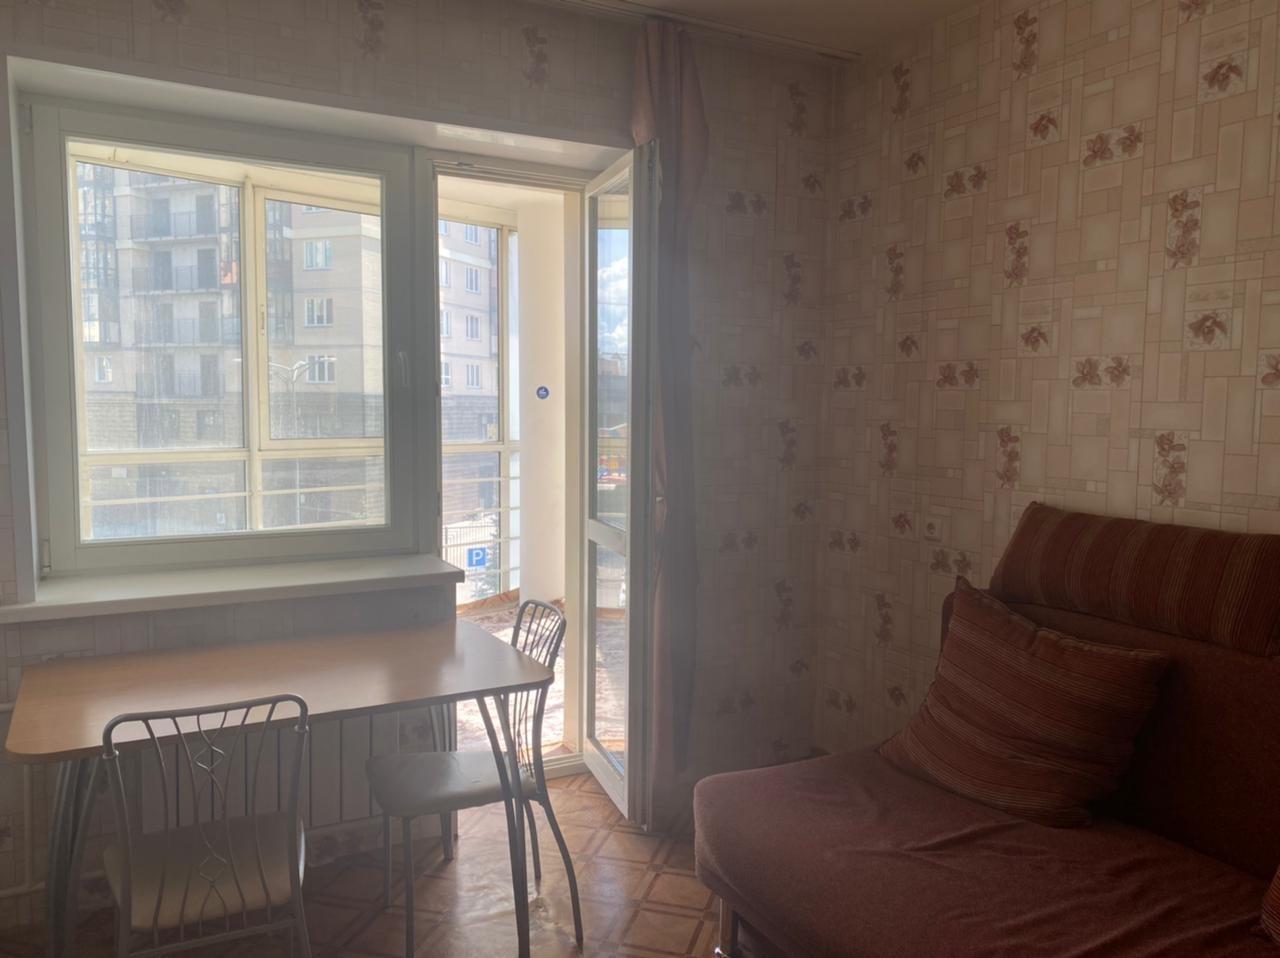 1к квартира Взлётка, микрорайон БЦ, улица Авиаторов, 25 | 18500 | аренда в Красноярске фото 4